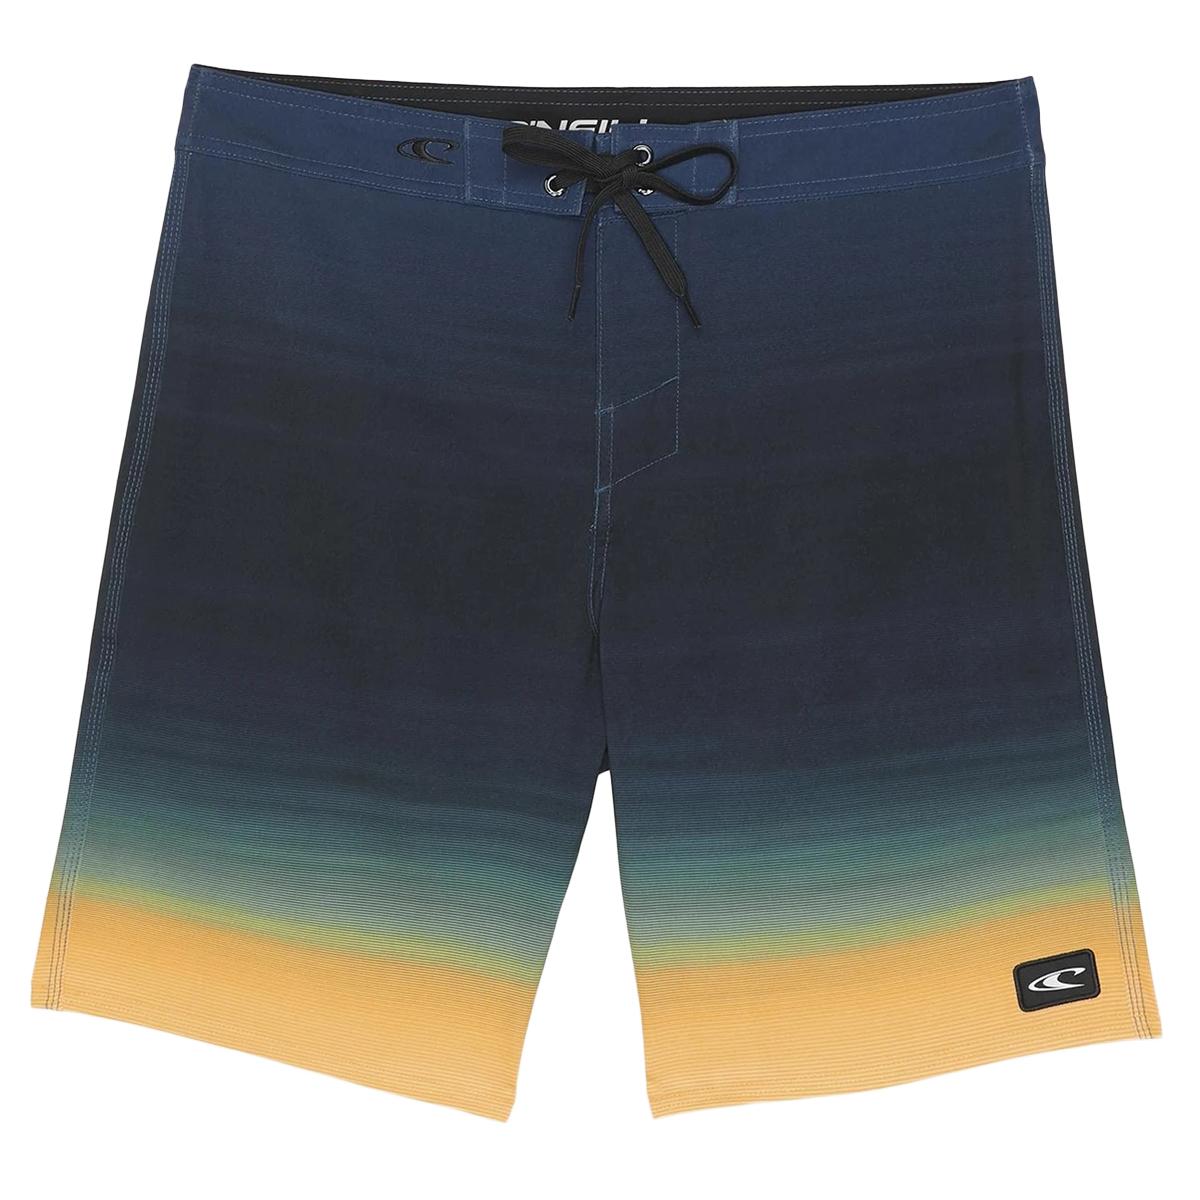 O'neill Men's Corban Boardshorts - Blue, 30